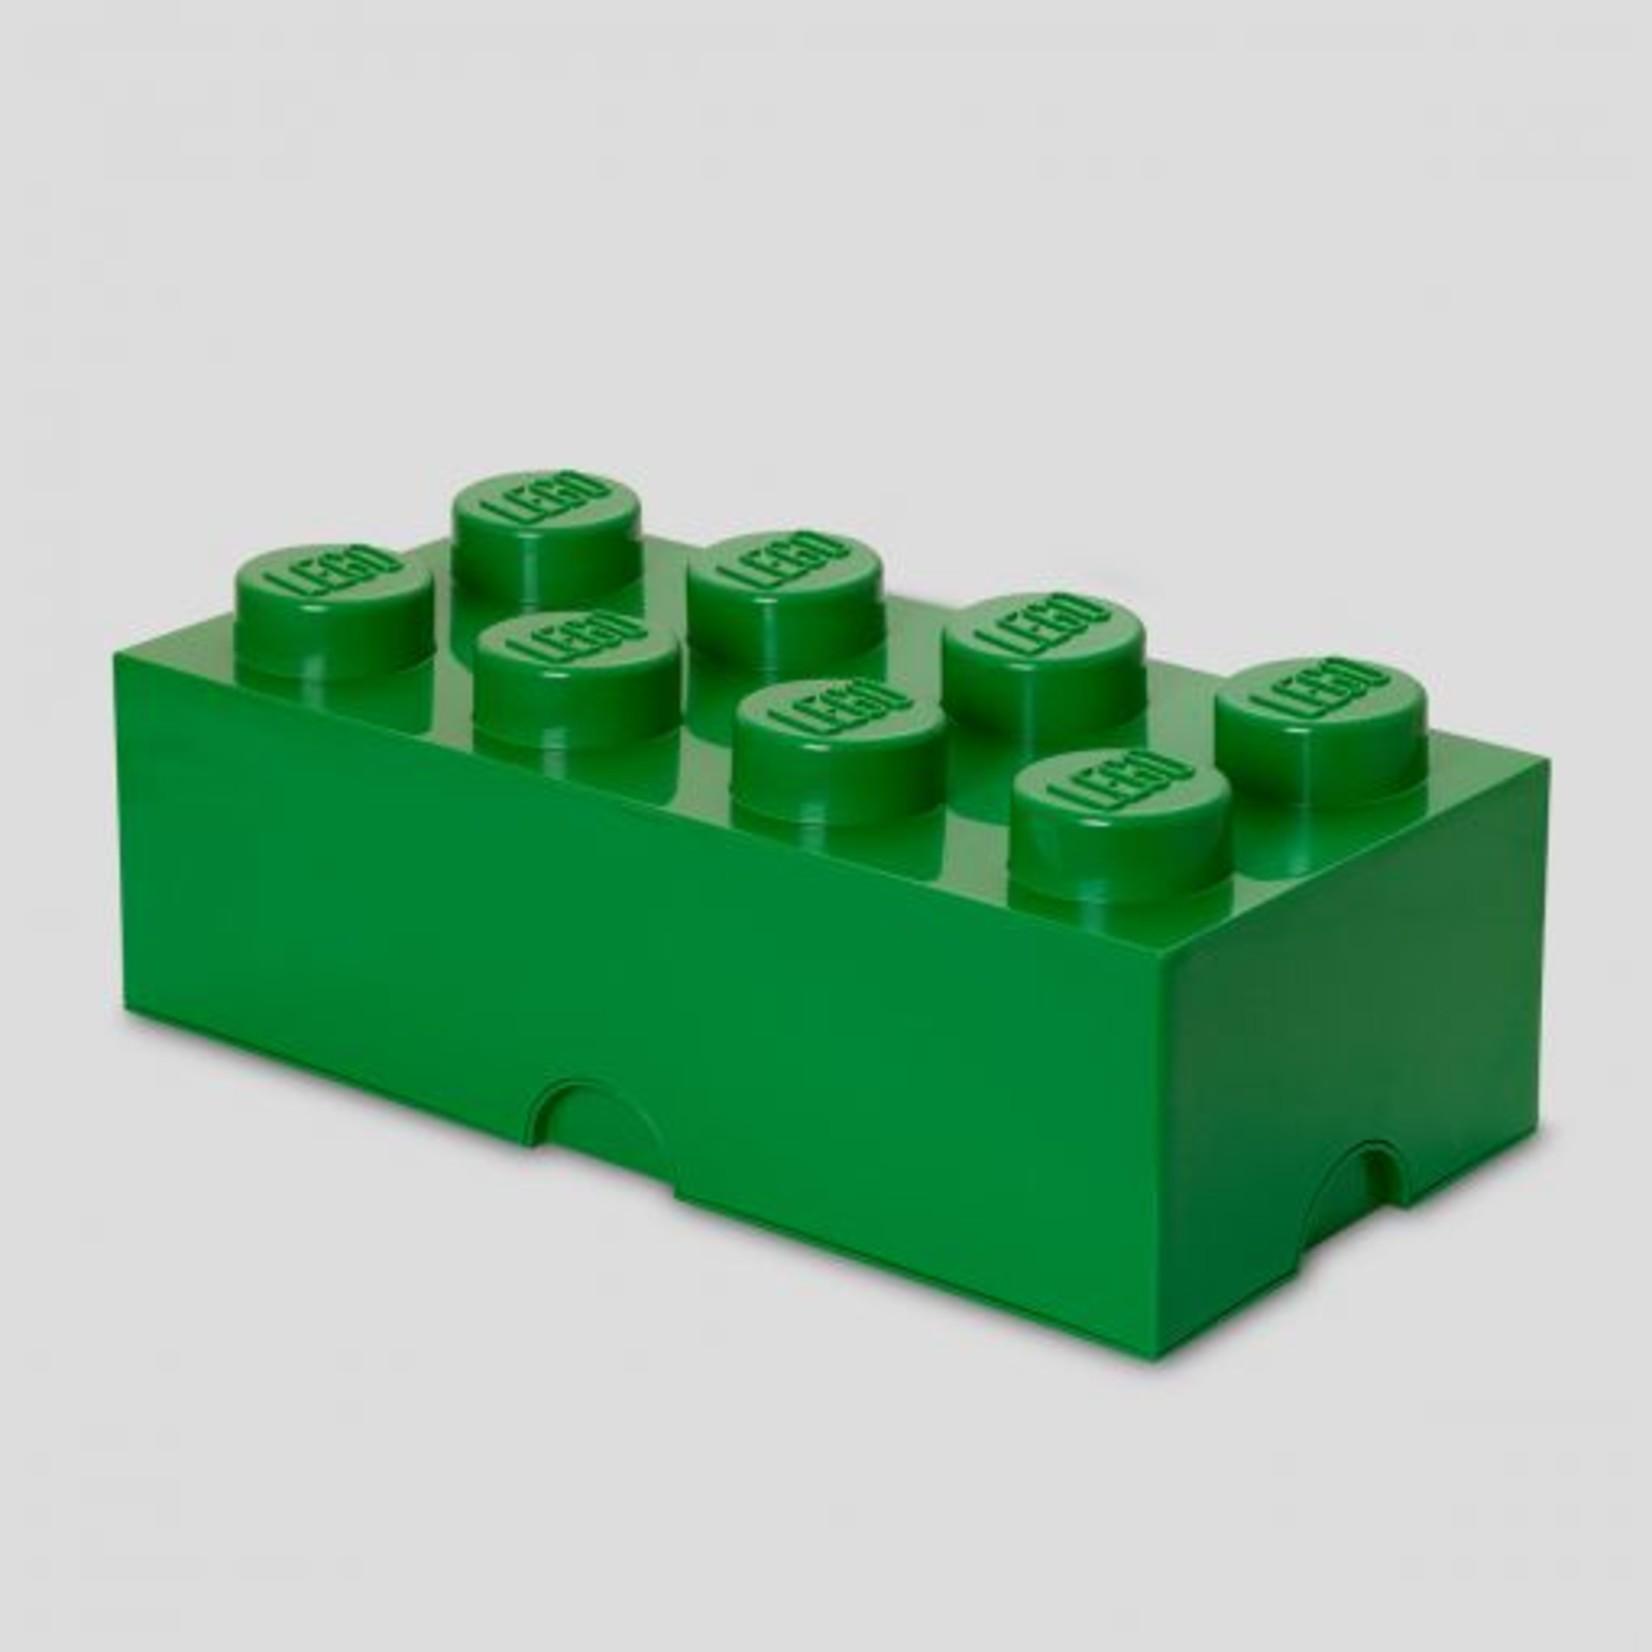 LEGO® Opbergbox LEGO brick 2x4 groen